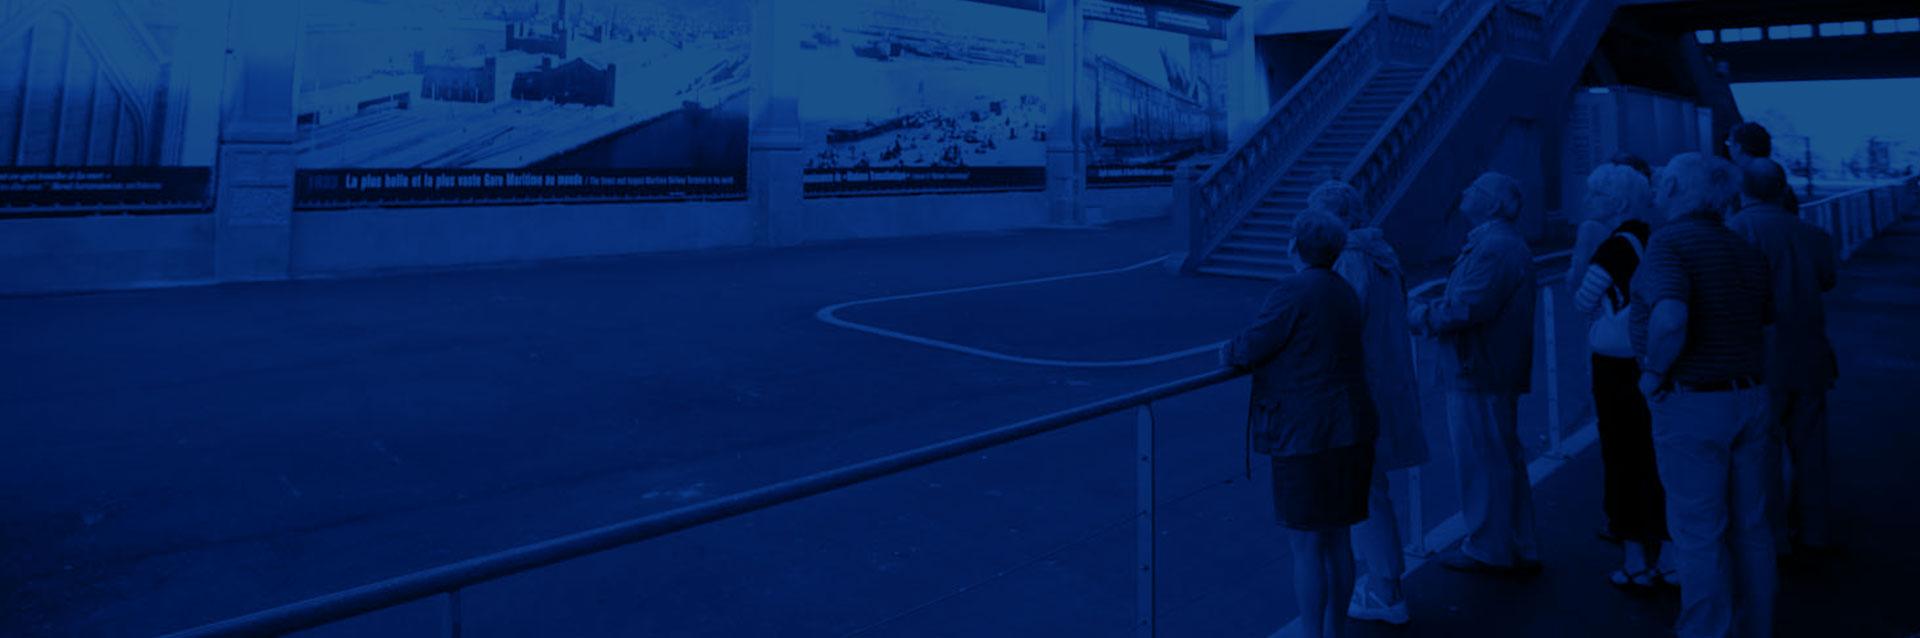 EspaceTitanic&Emigration-Visiteprivative-bleu